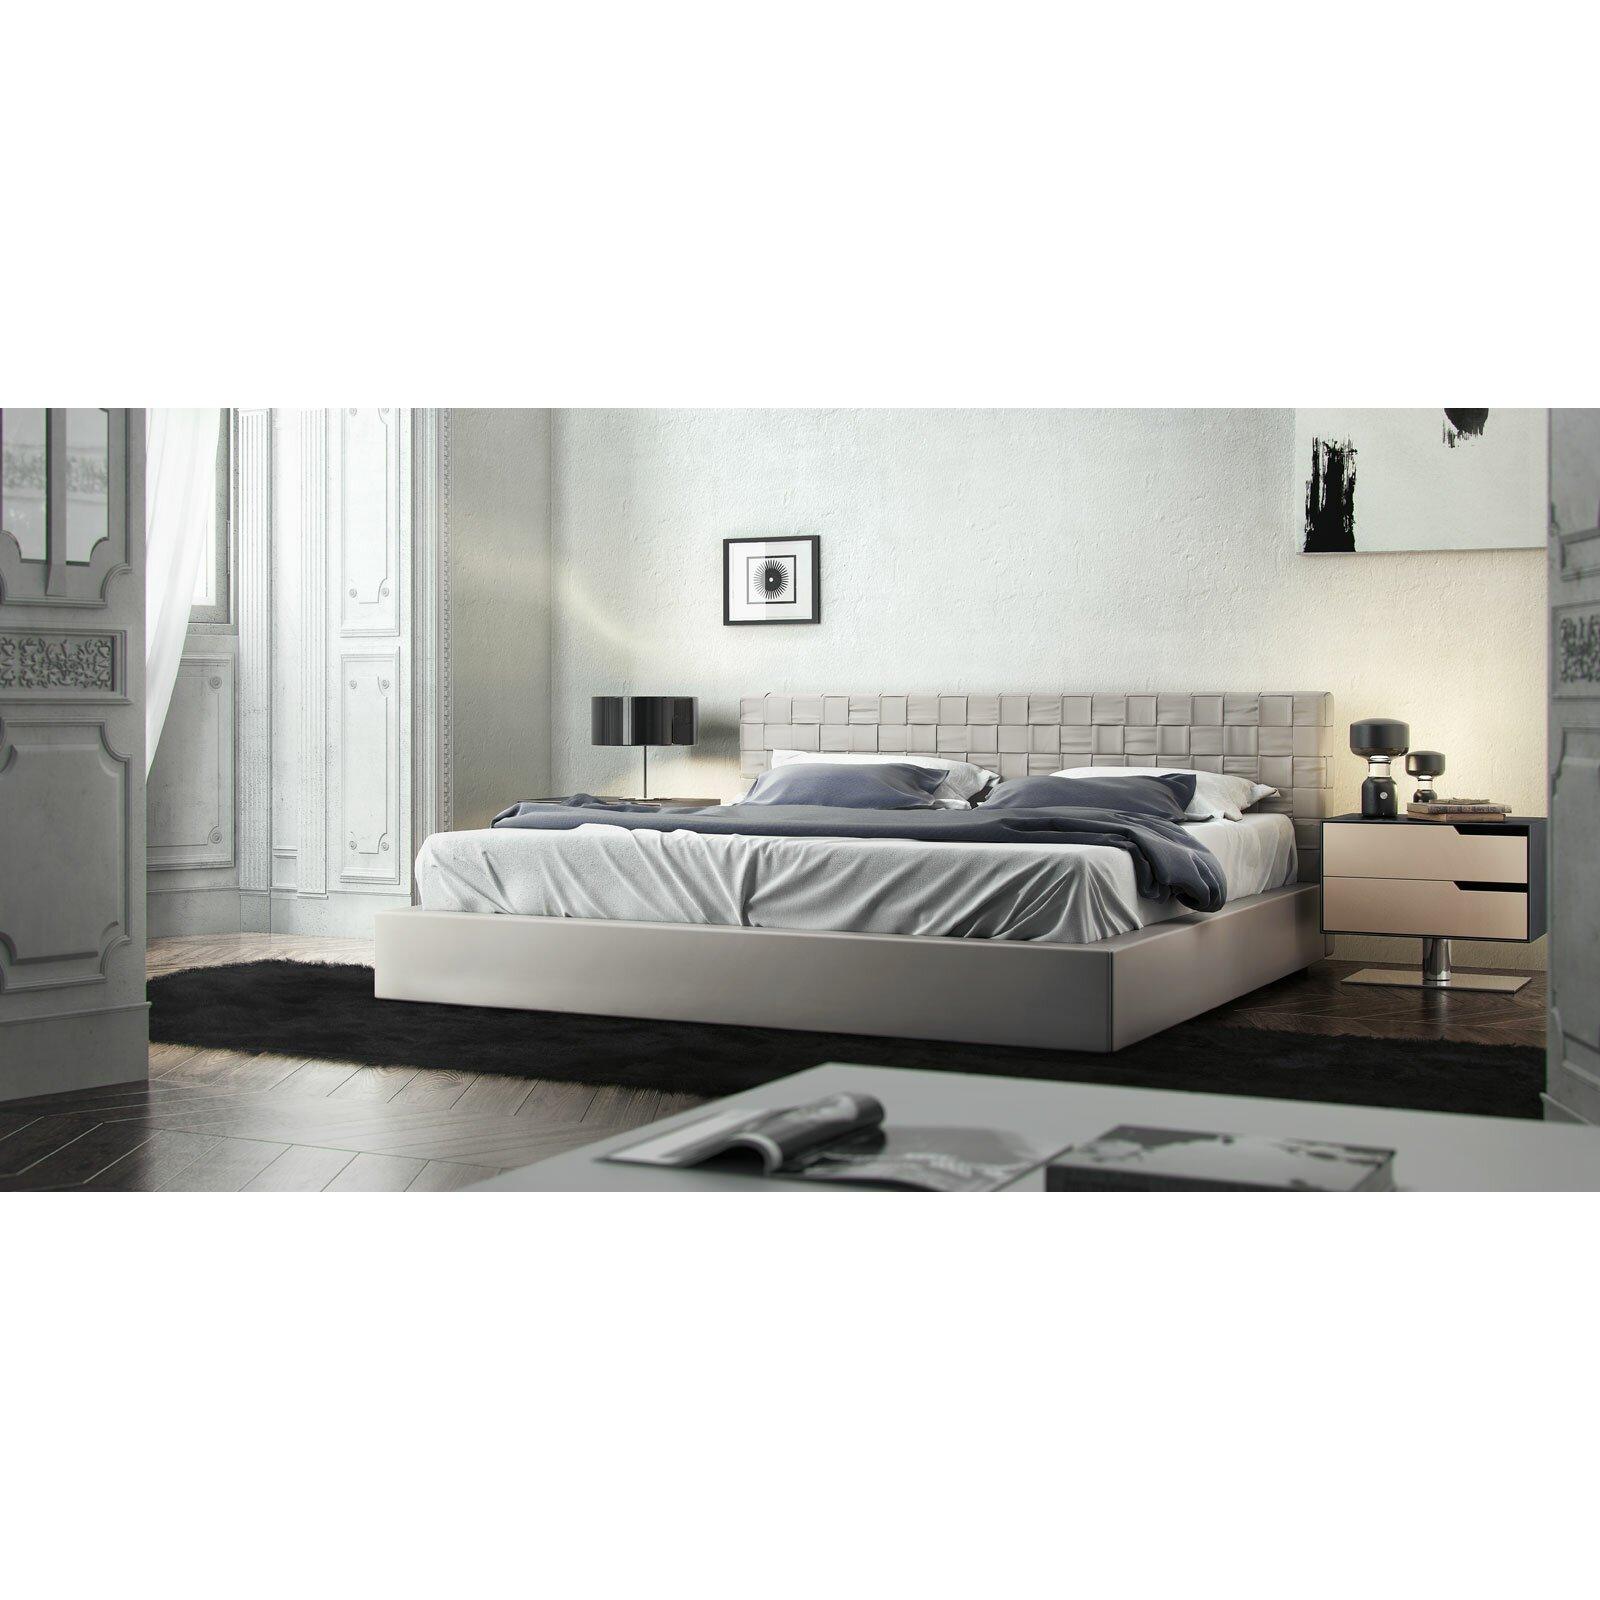 Modloft Twin Bed